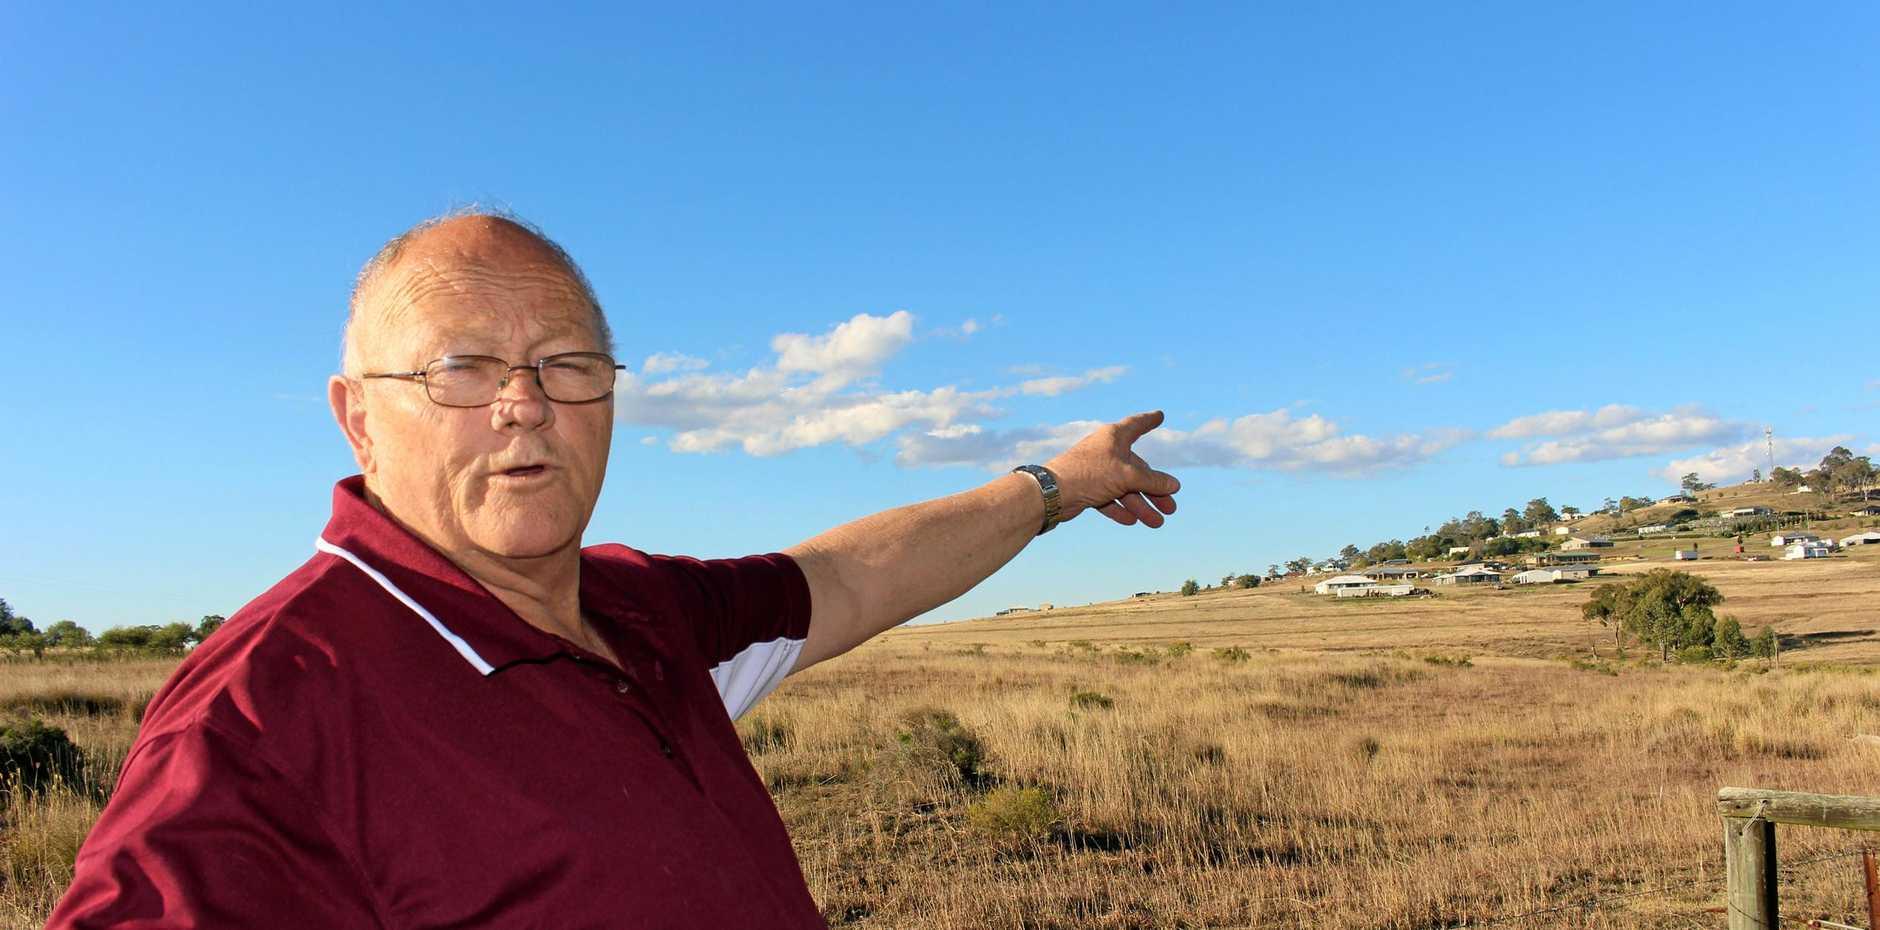 LOOKING ON THE SUNNY SIDE: Alwyn Cutmore said embracing a multi-million dollar solar farm could help the Warwick community move forward.